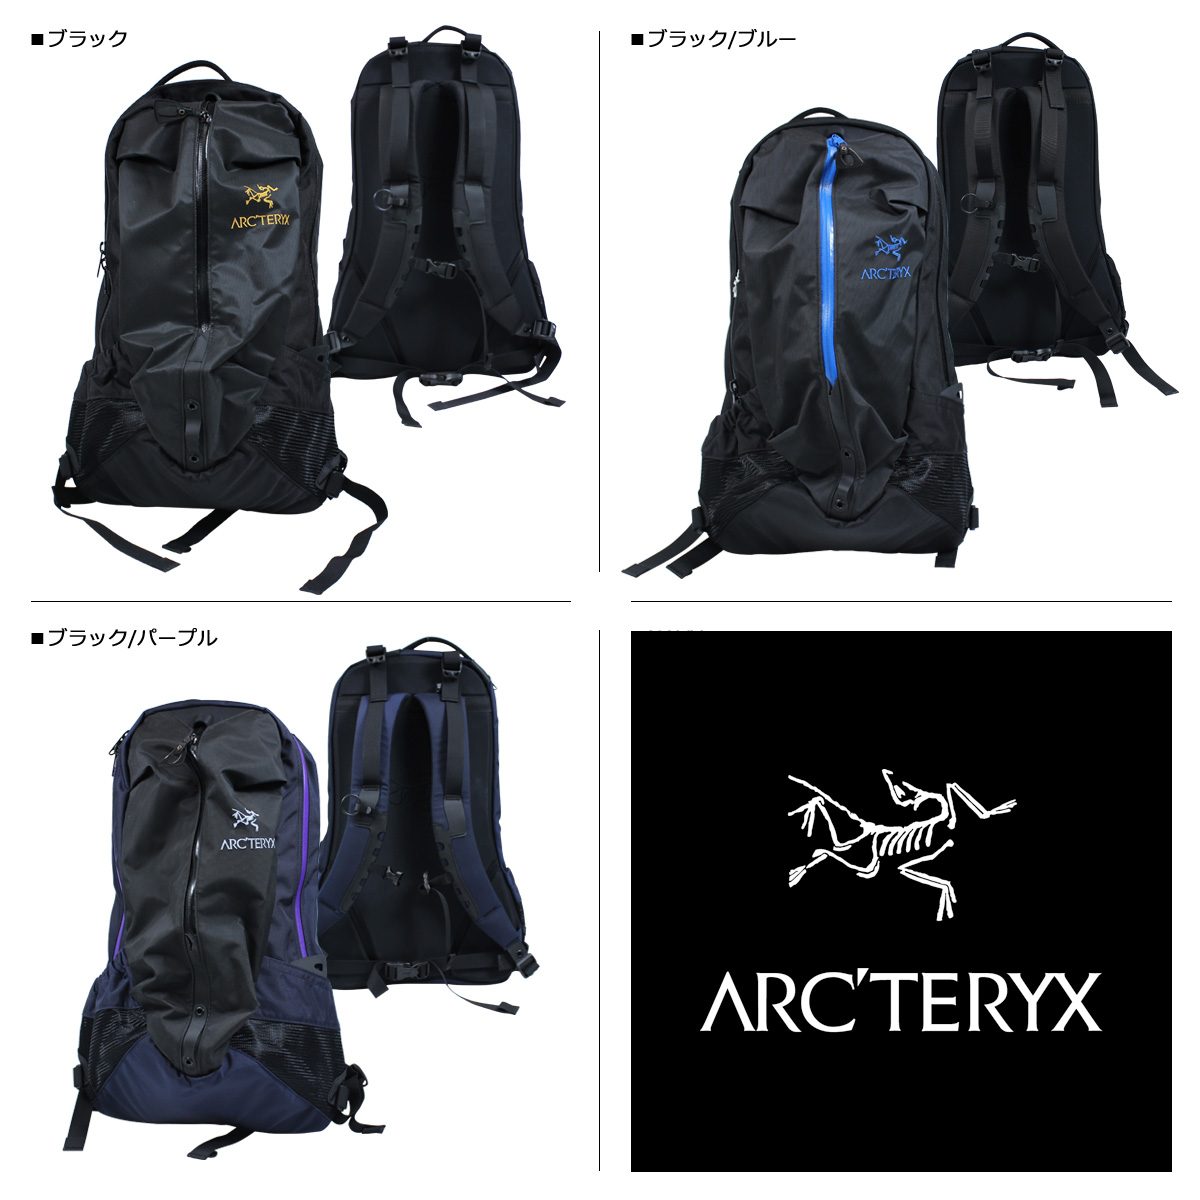 ARC'TERYX アークテリクス リュック アロー22 バックパック 22L 6029 ARRO 22 BACKPACK メンズ